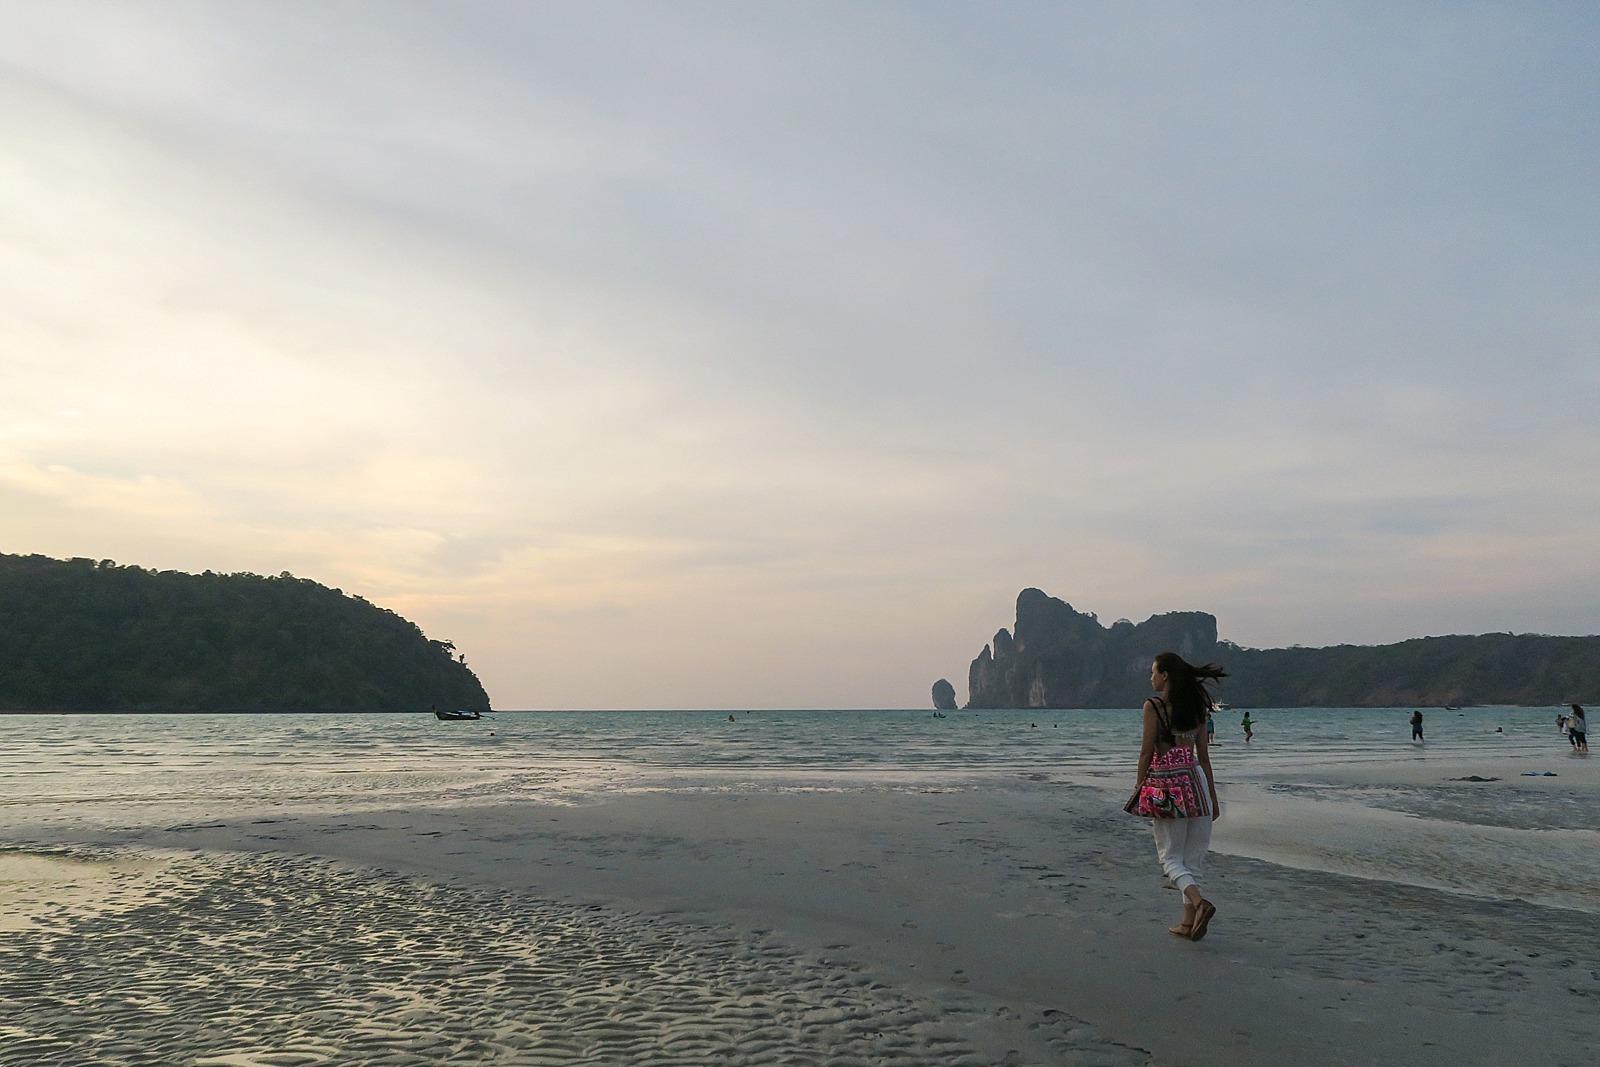 diana elizabeth blogger talkking a walk at dusk on Koh phi phi island low tide